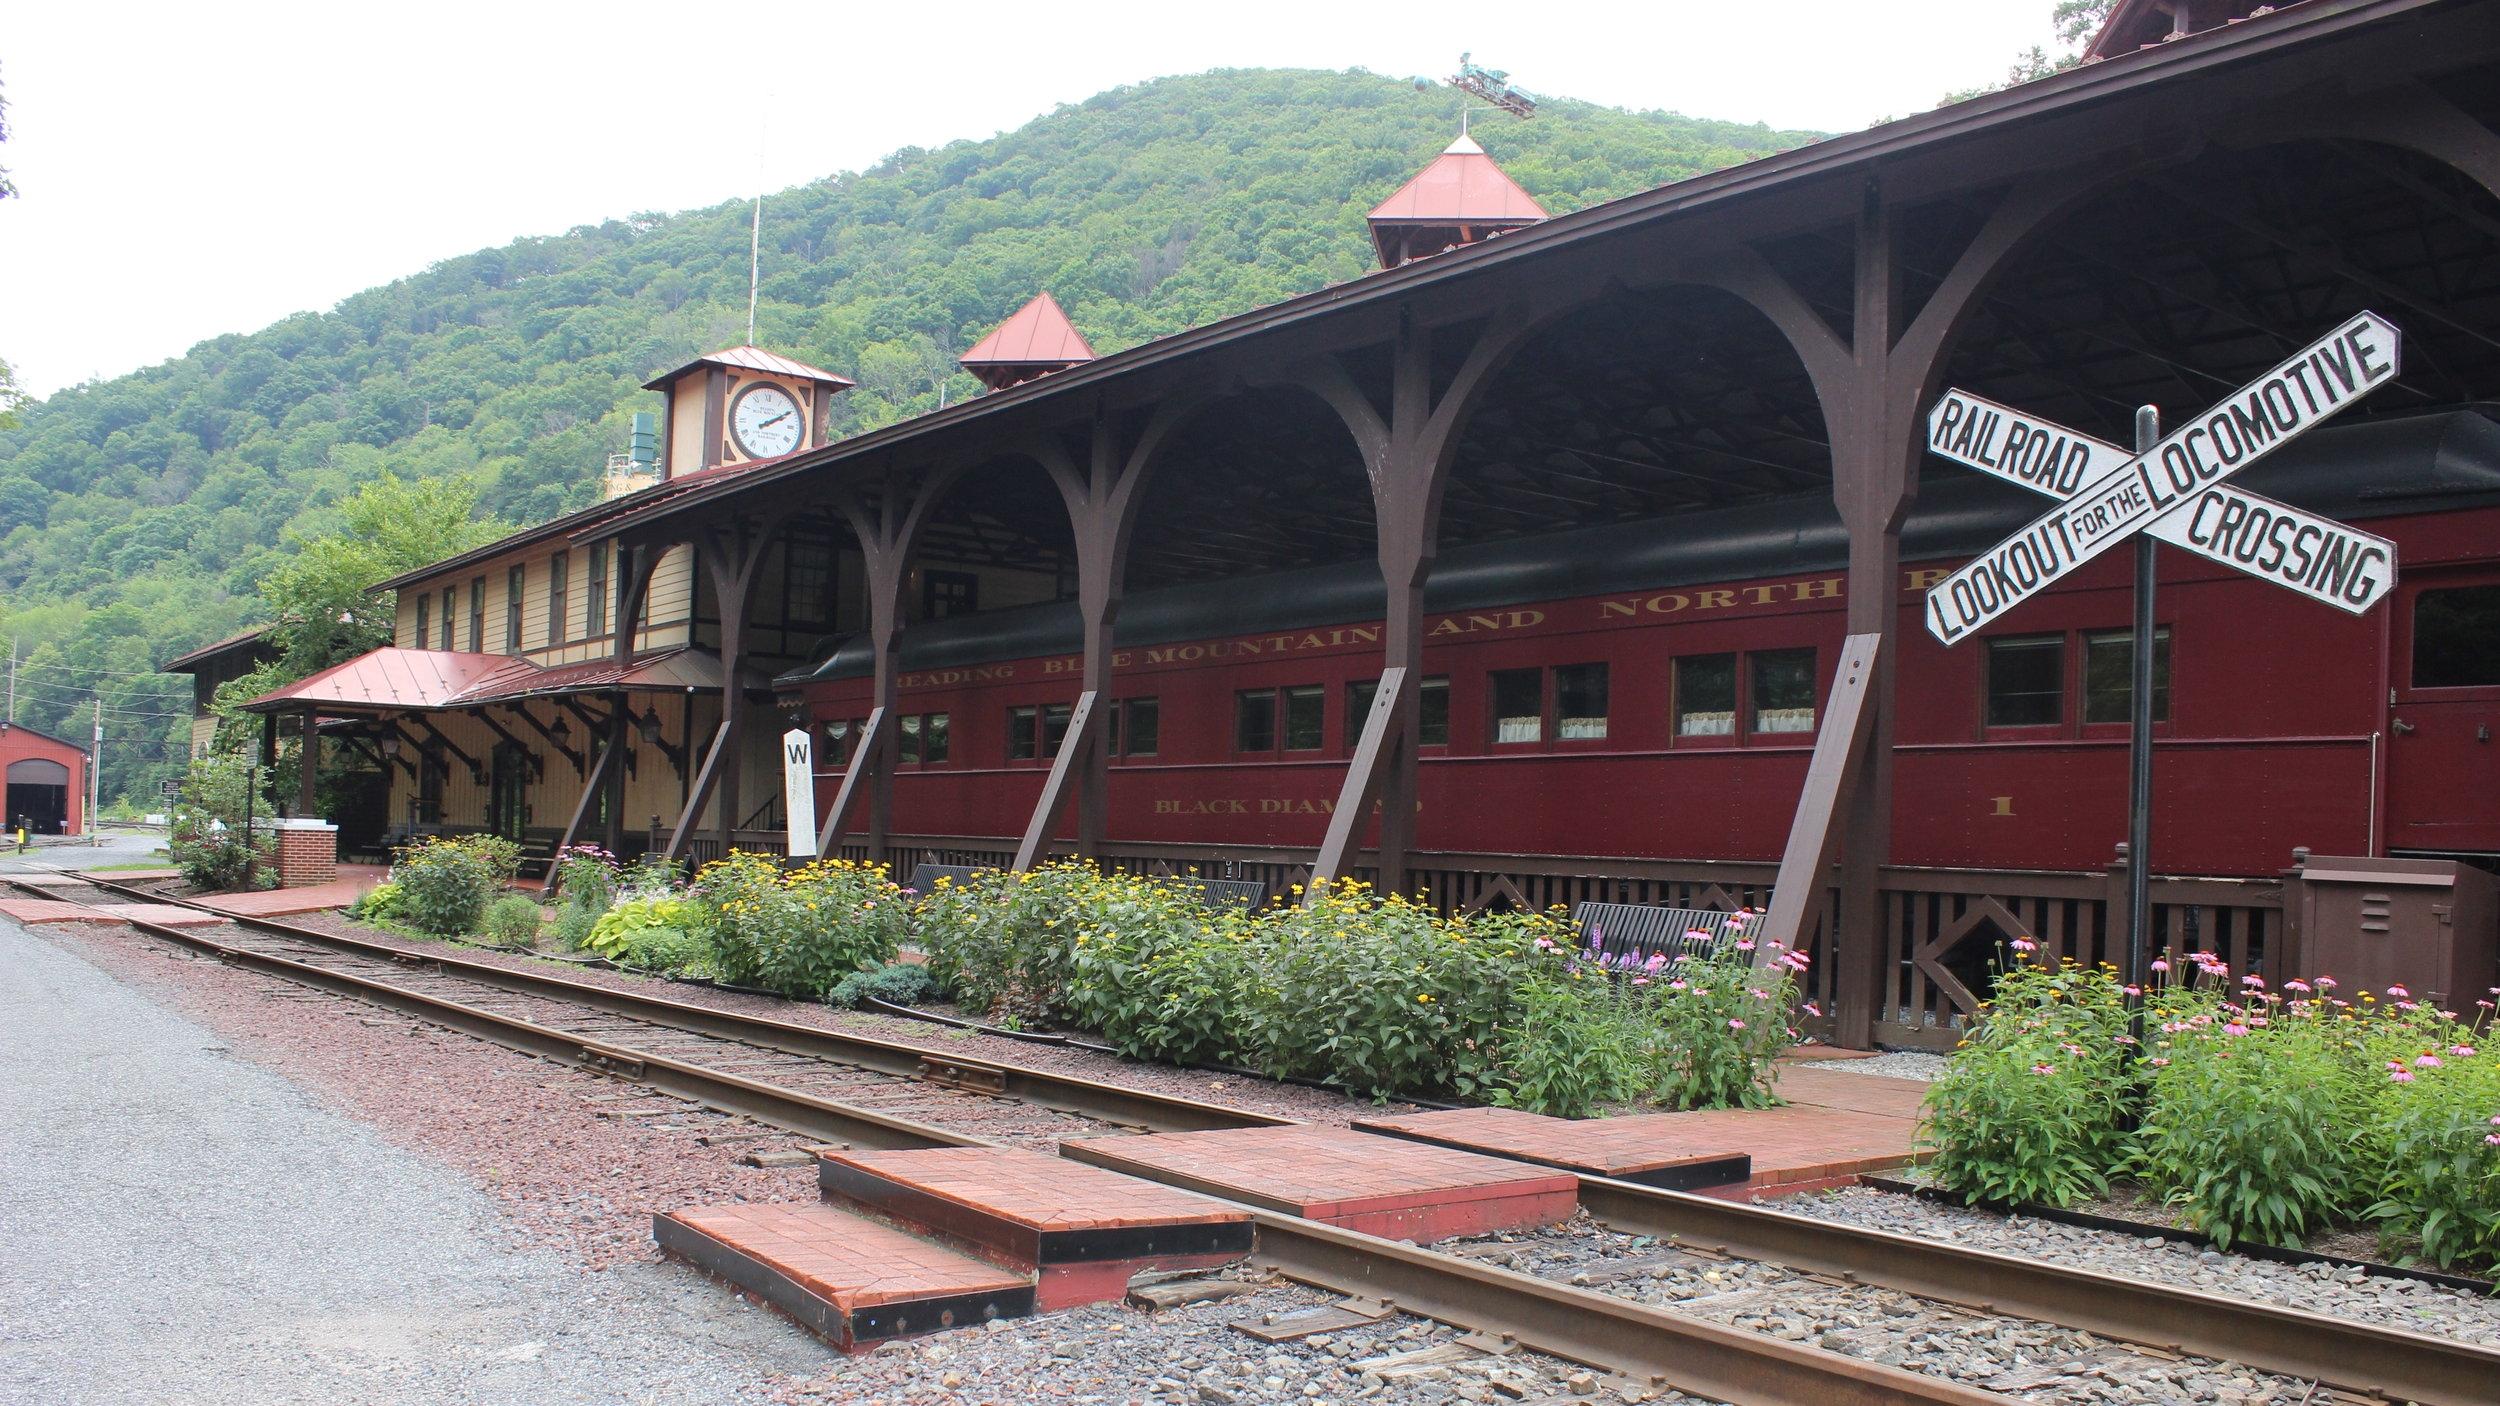 Port Clinton Station -